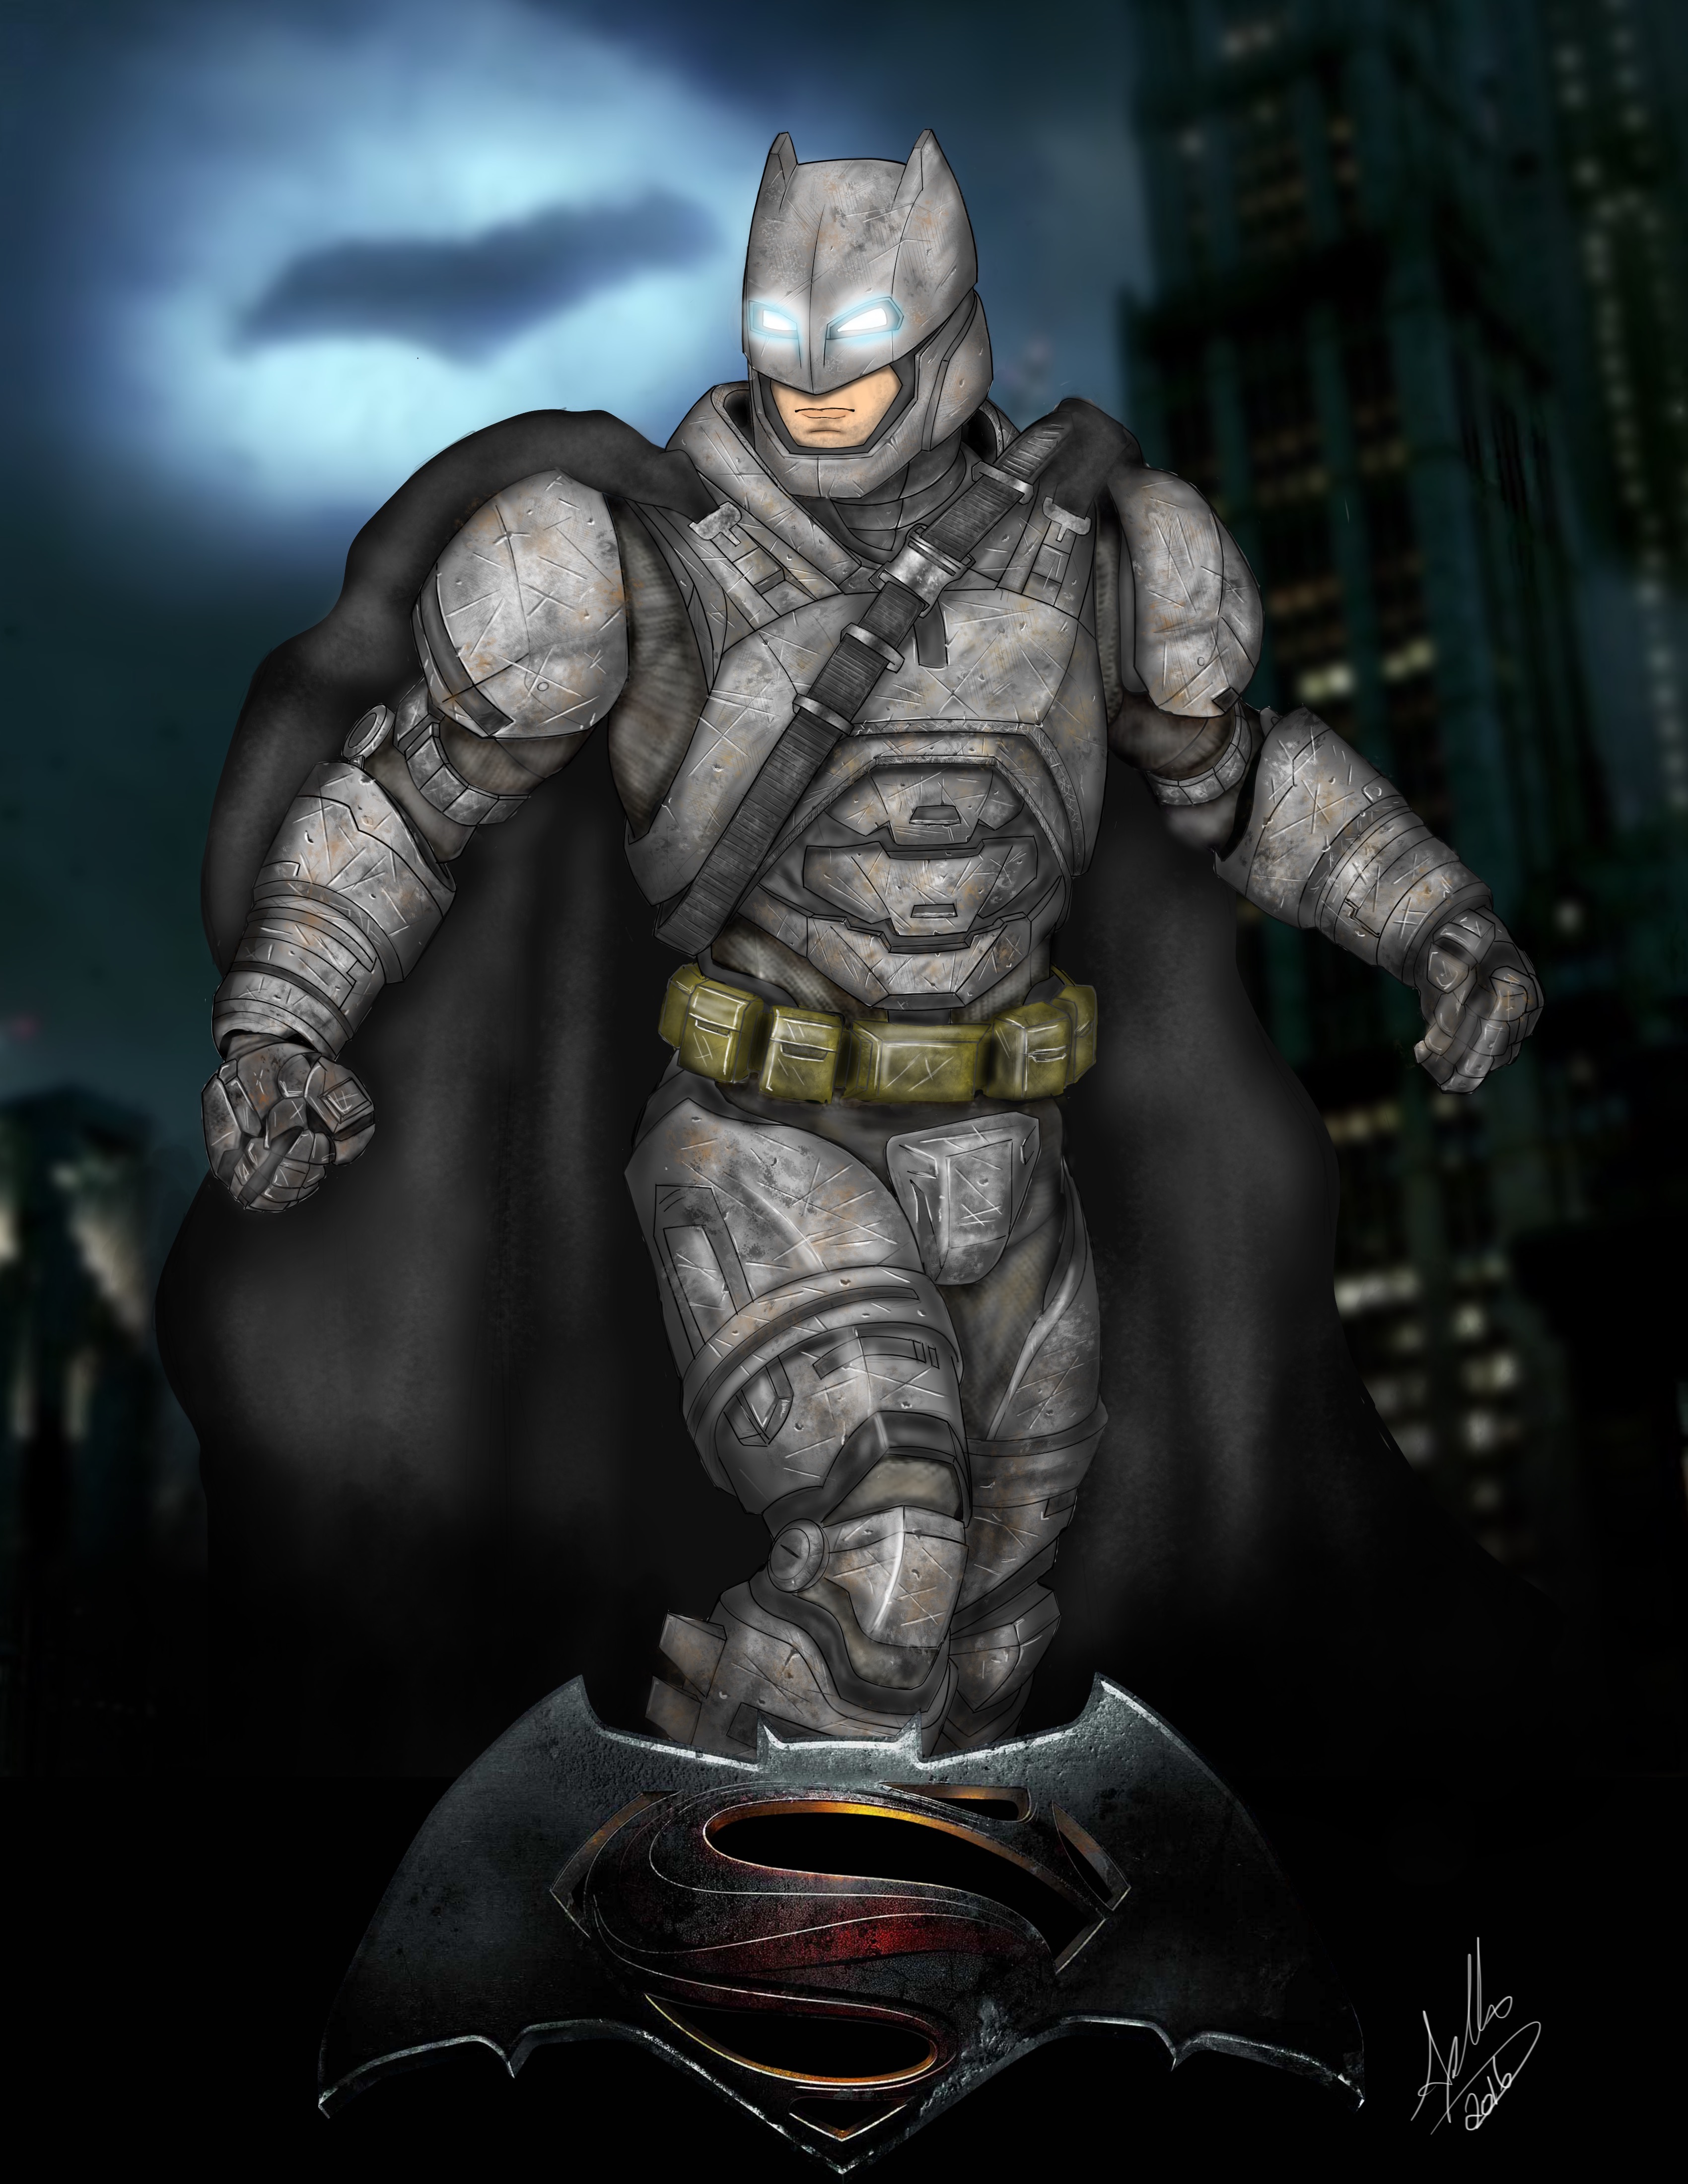 Armor Batman